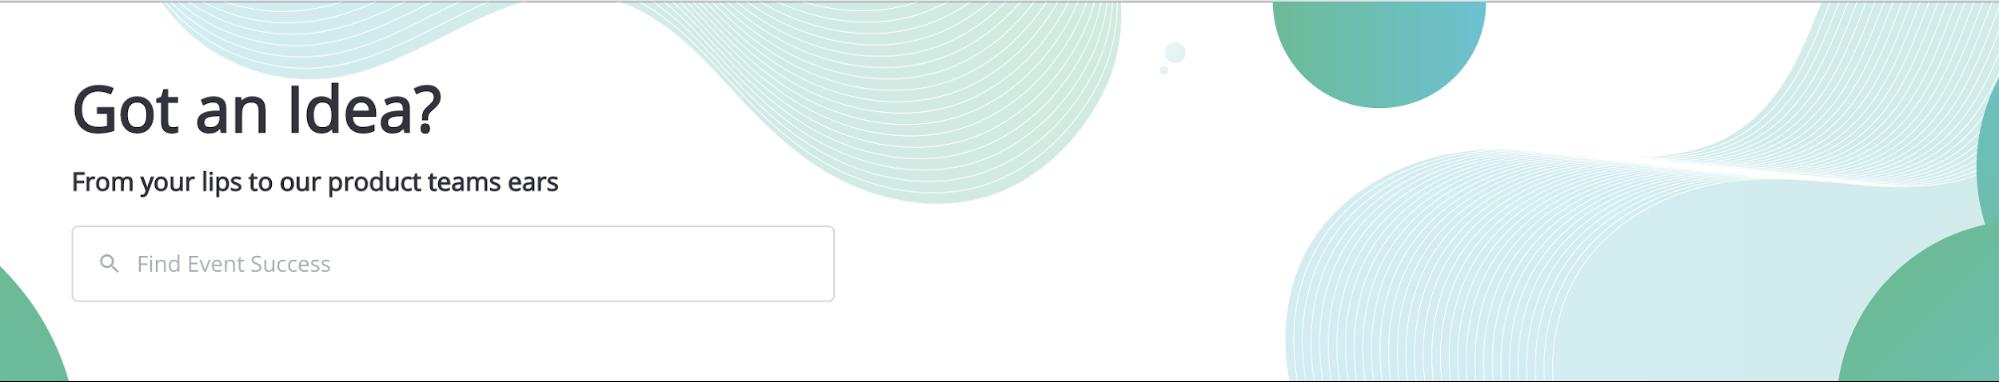 Virtual Suggestion Box - Audience Enagement